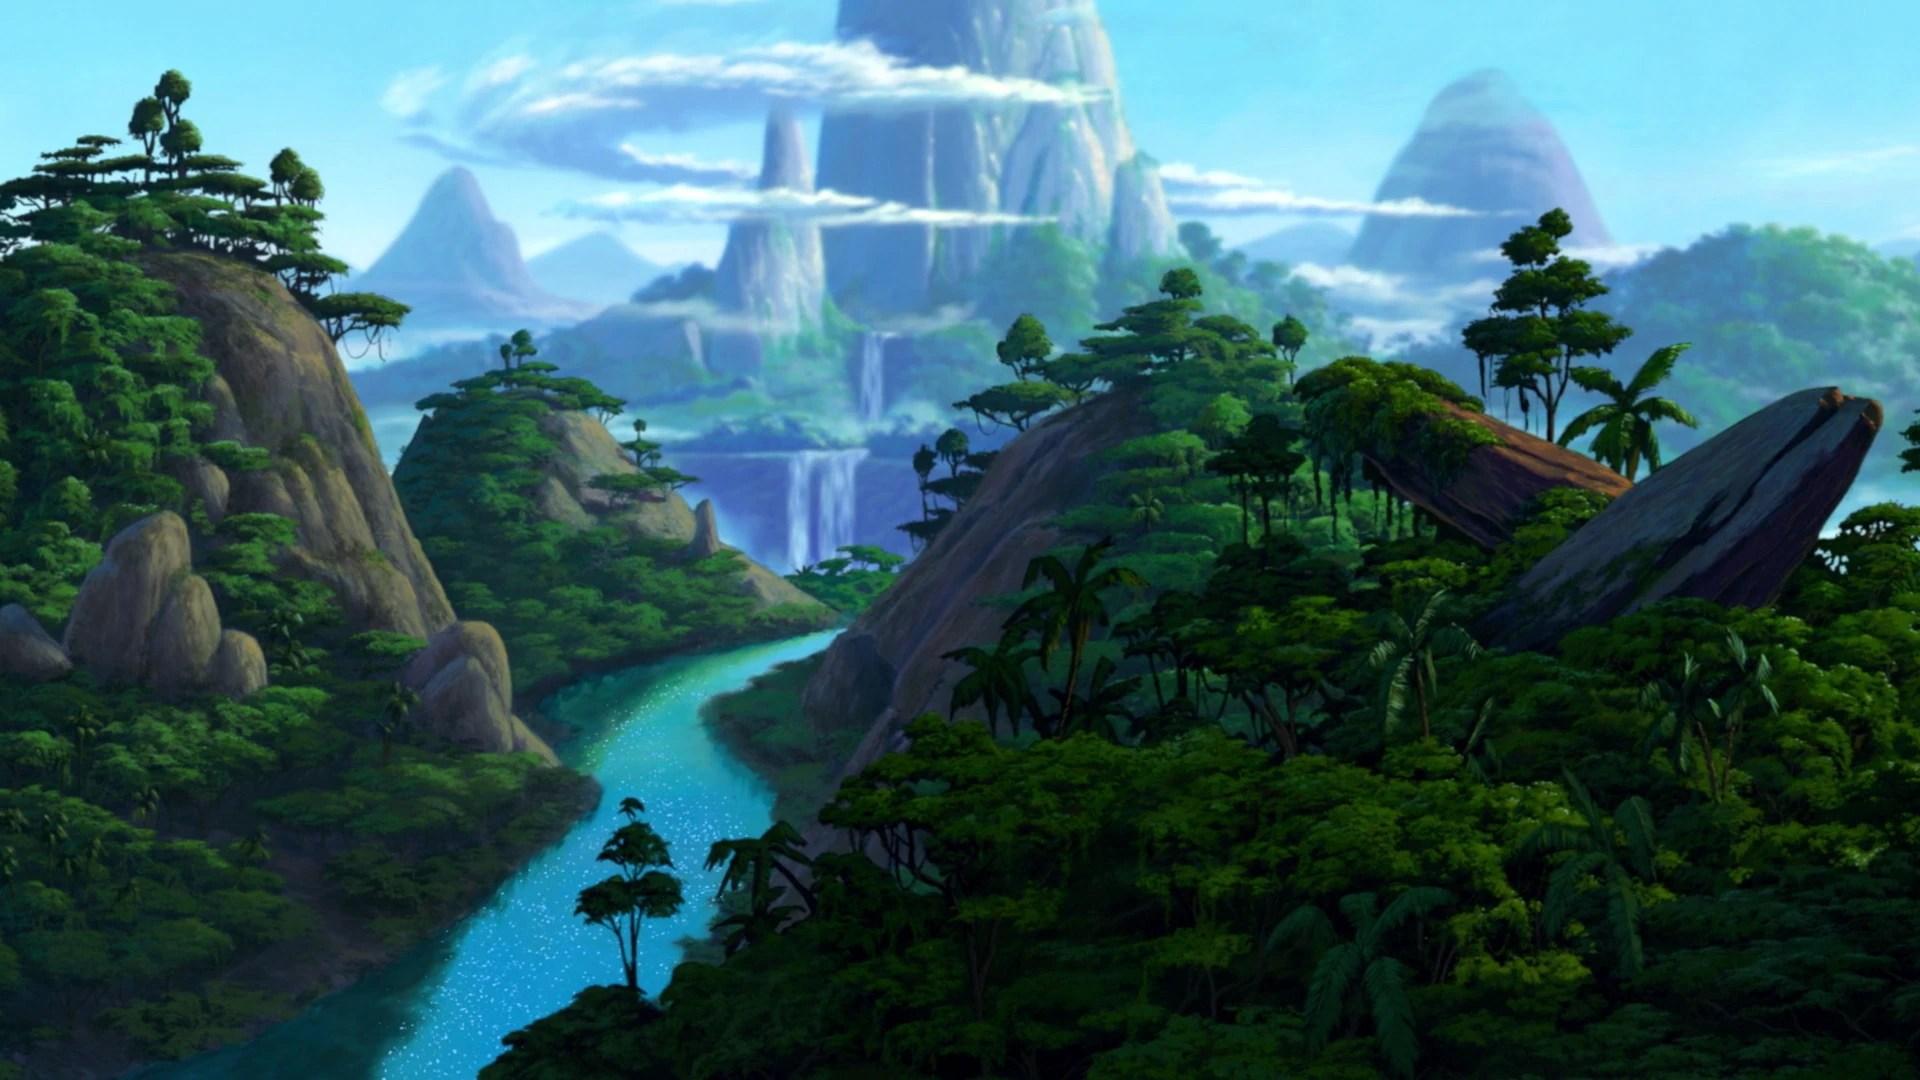 3d Frog Wallpaper Jungle The Lion King Disney Wiki Fandom Powered By Wikia